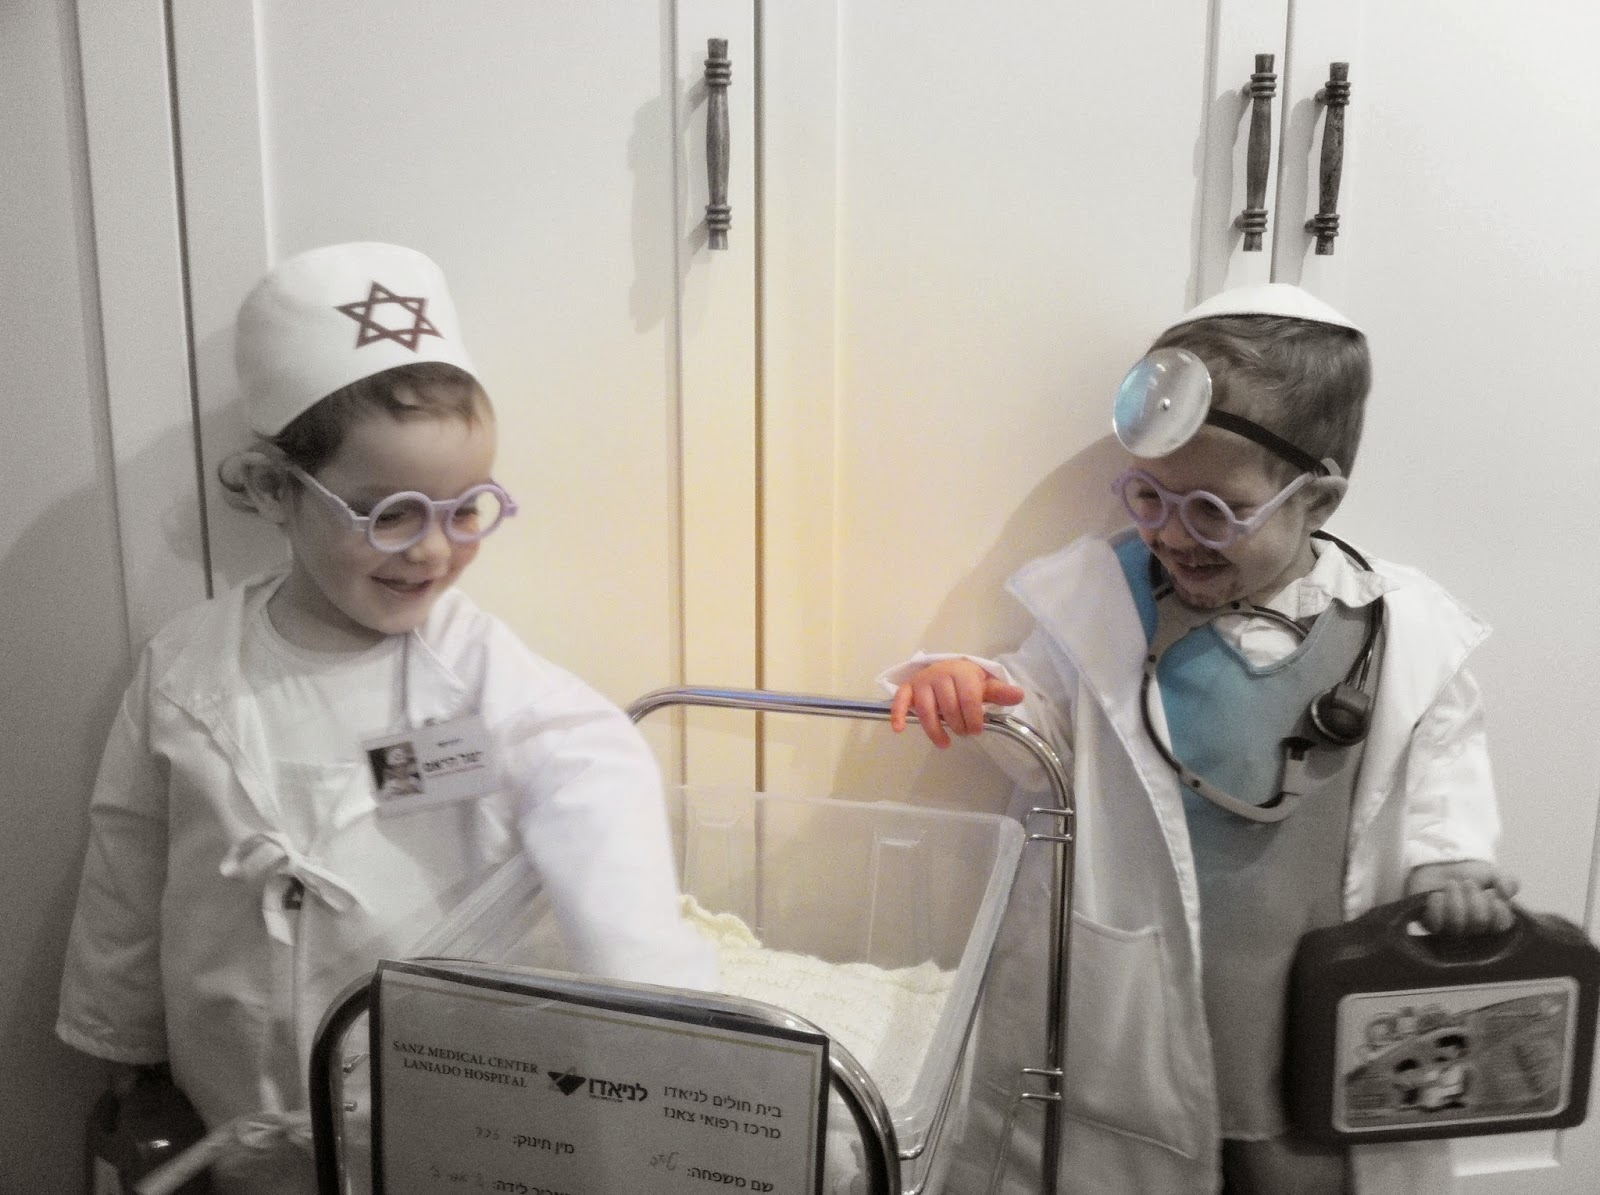 IMG 5322 - התחפשנו לרופאים!!!